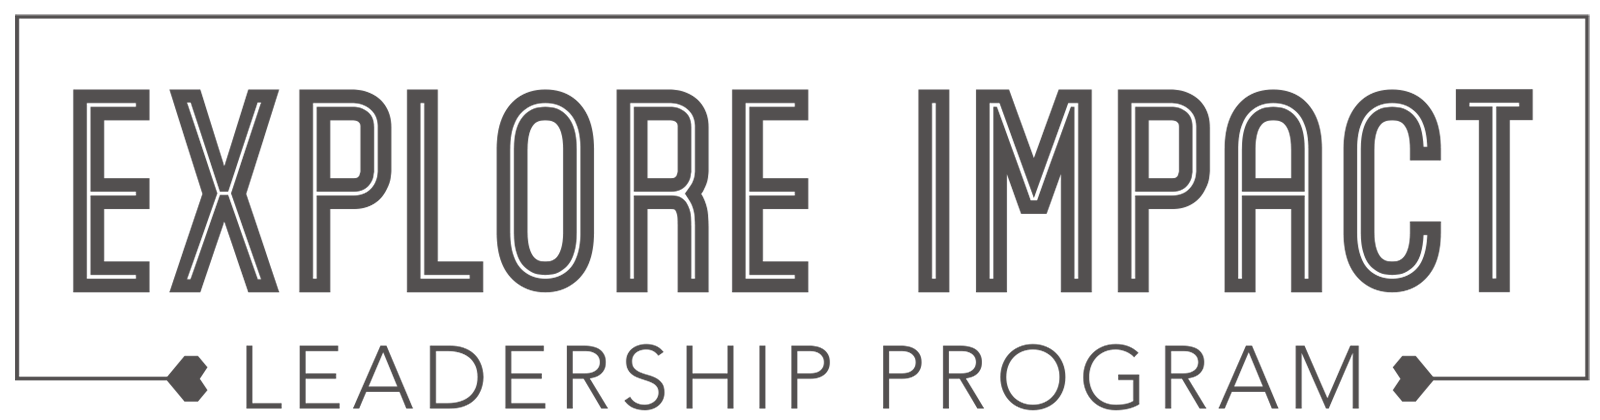 Explore Impact Leadership Program